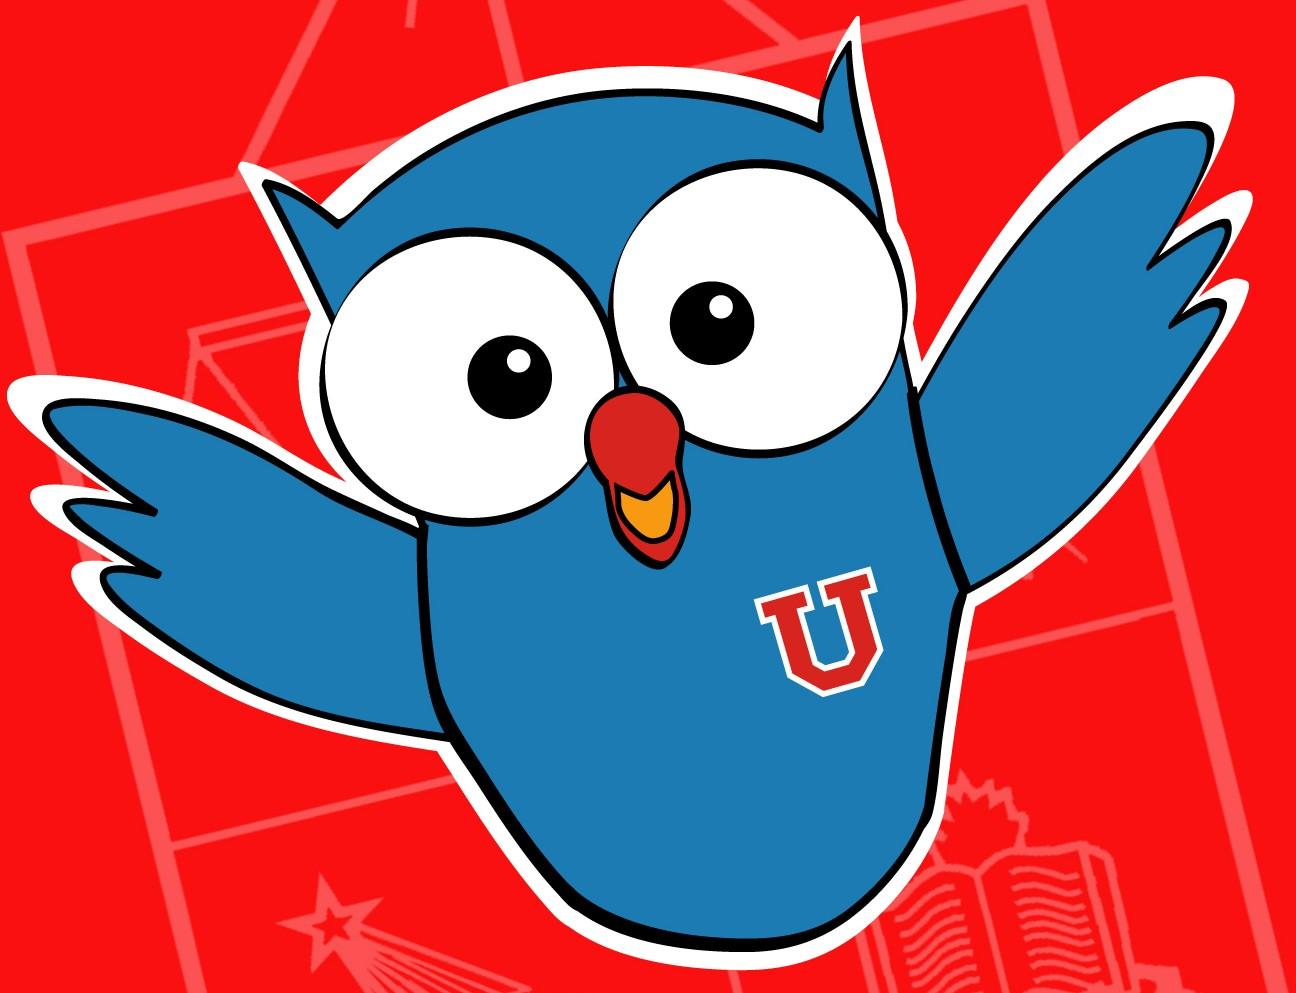 http://4.bp.blogspot.com/-N3mbquUELzg/TzlfQv0sGJI/AAAAAAAABWo/Z7KZLhDaQfw/s1600/universidad-de-chile.jpg